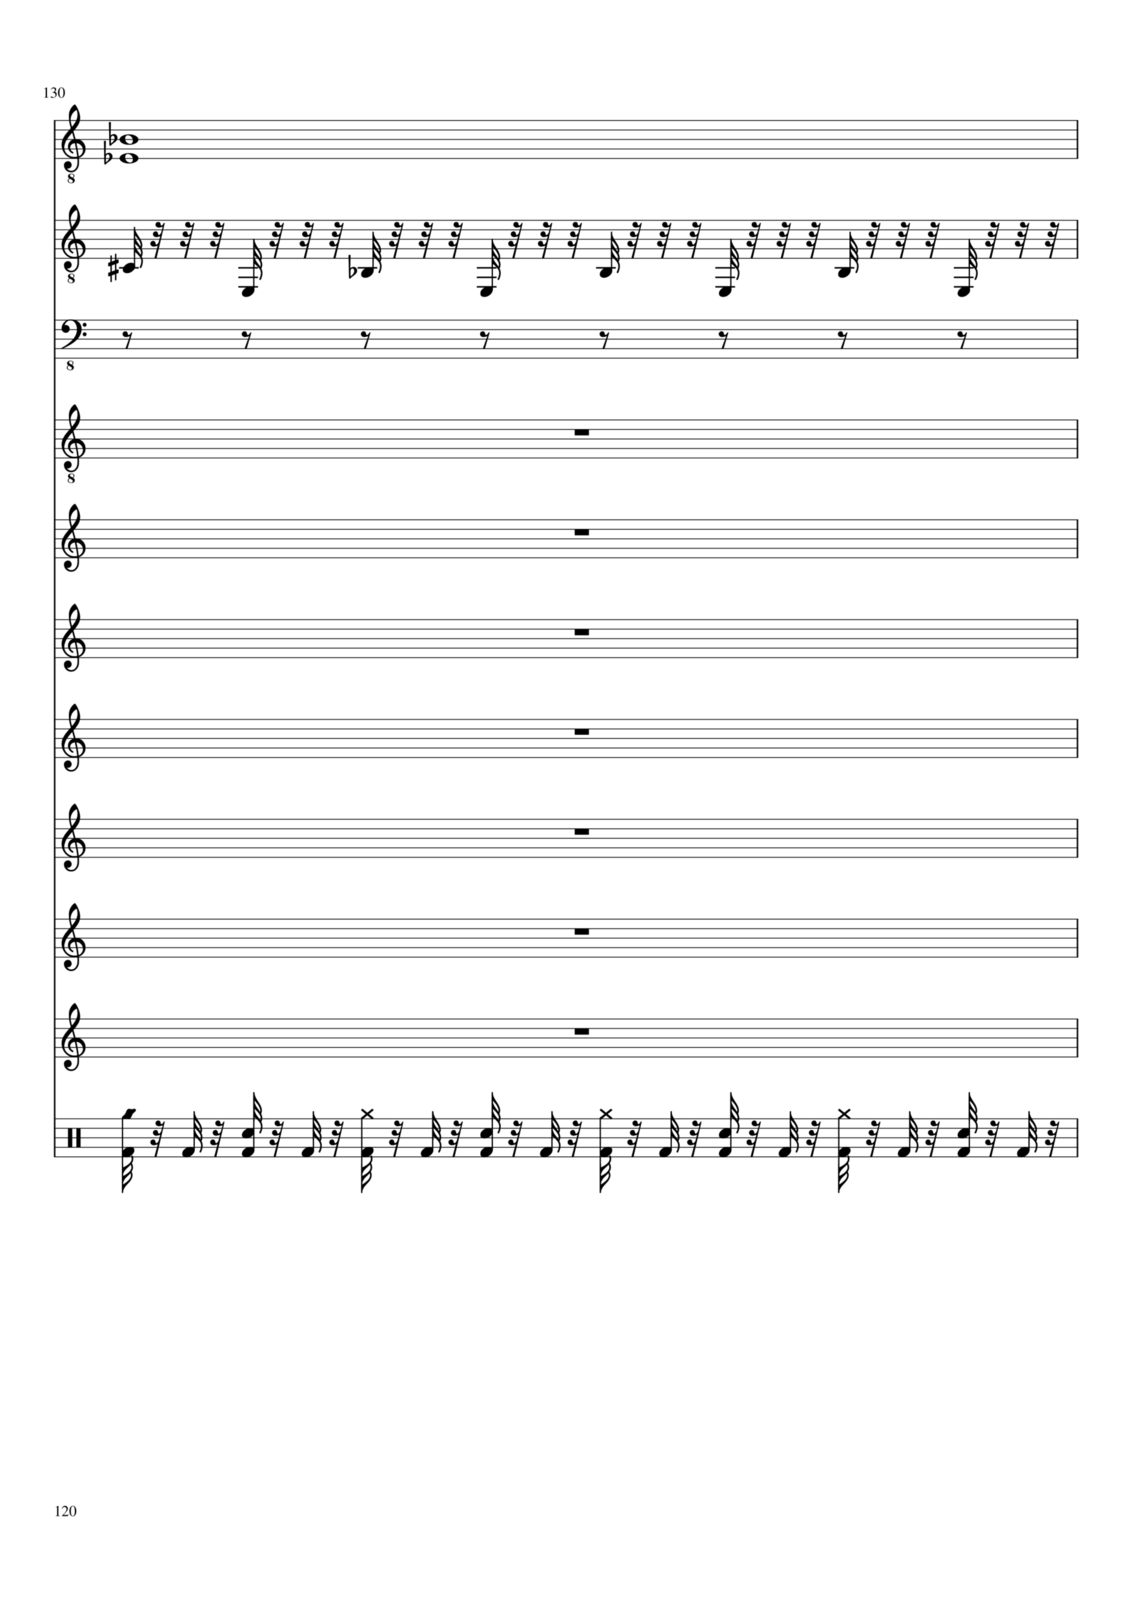 Belyiy sokol slide, Image 120